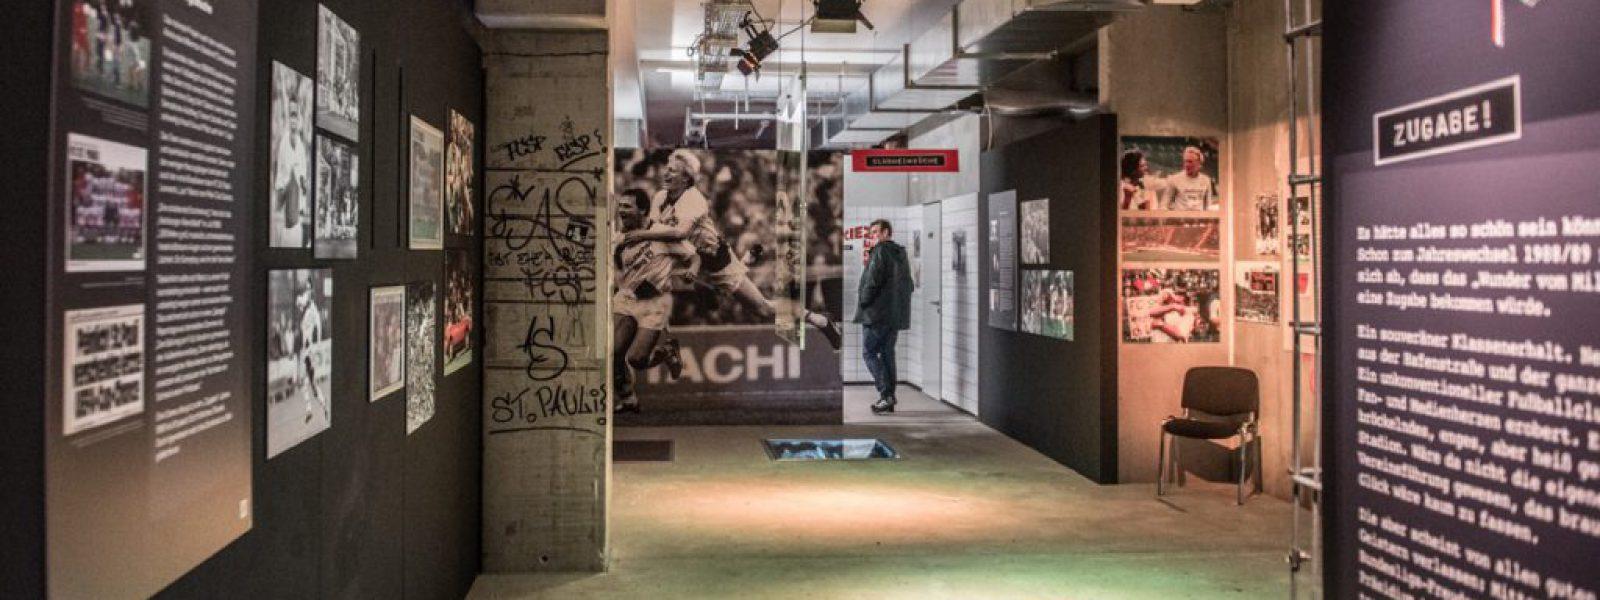 Eroeffnung FC St Pauli Museum (Foto Sabrina Adeline Nagel) - 32